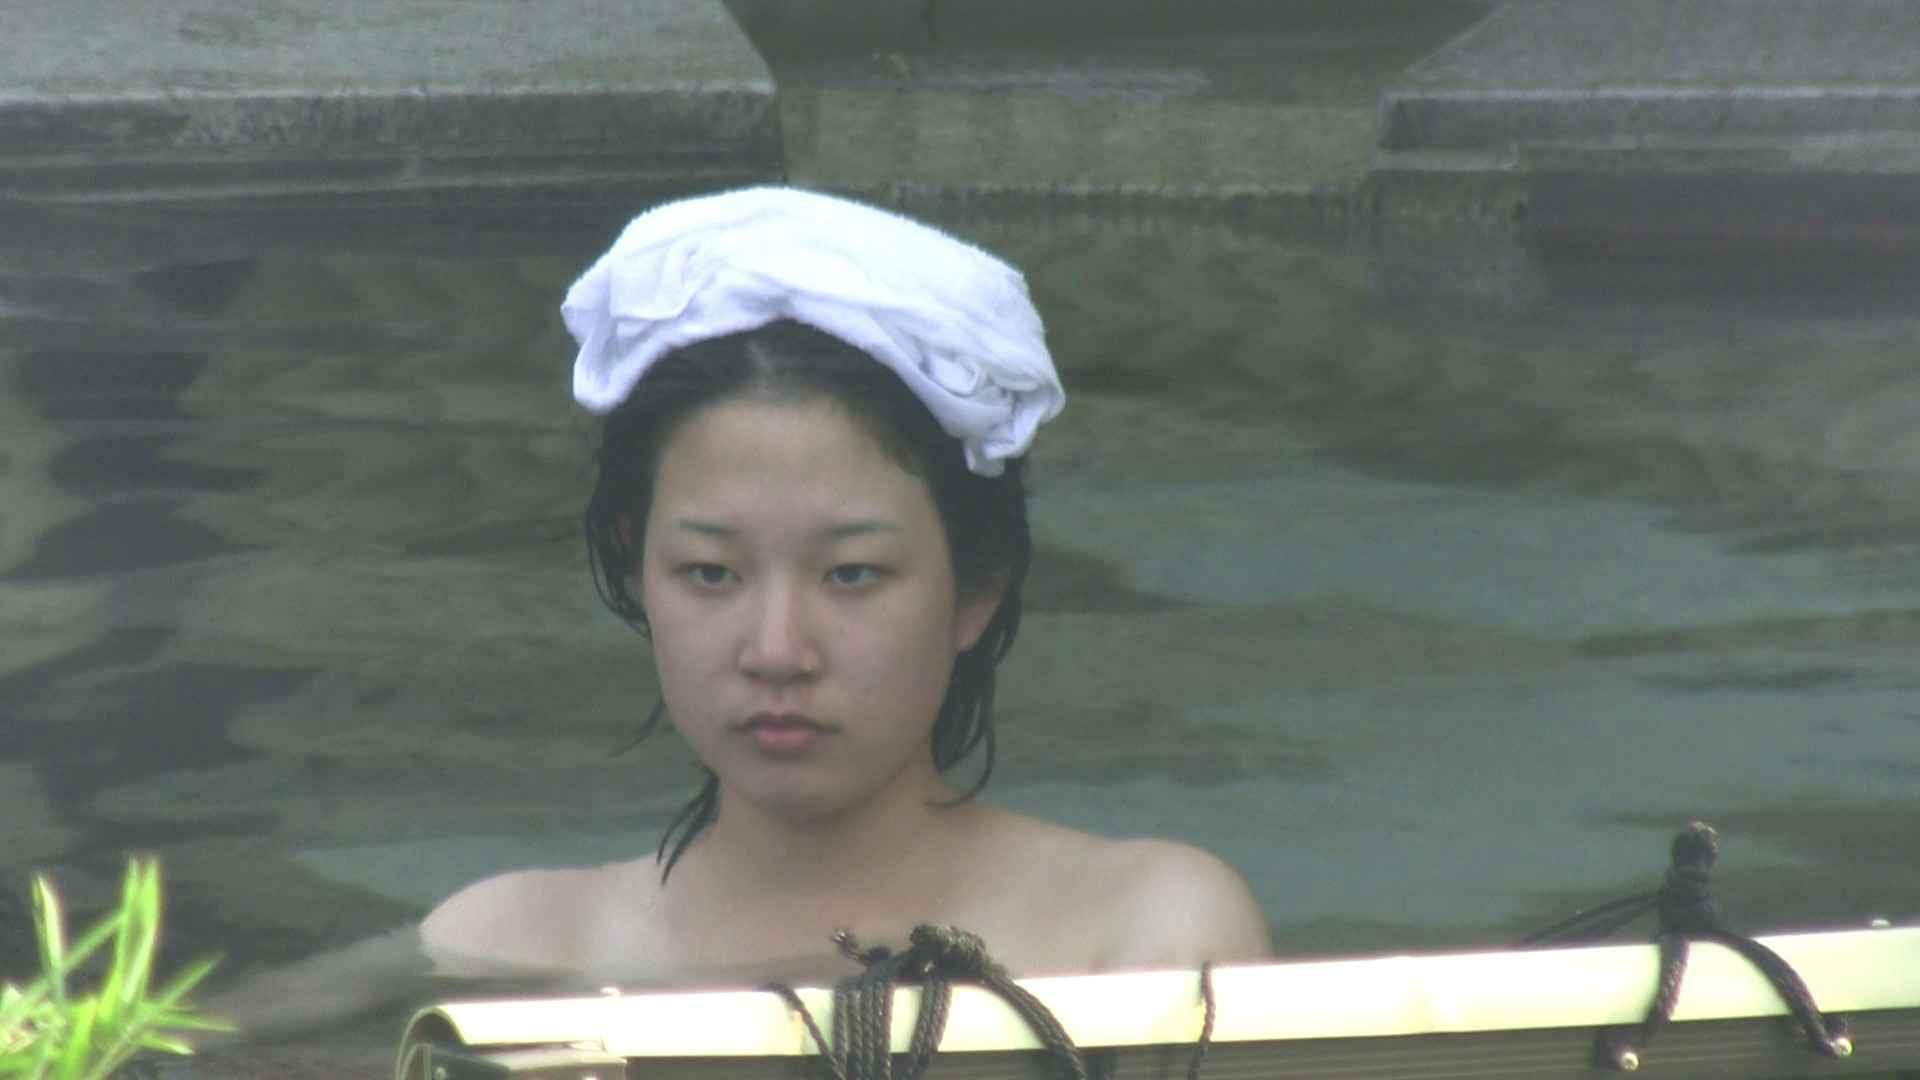 Aquaな露天風呂Vol.172 盗撮映像  113Pix 46